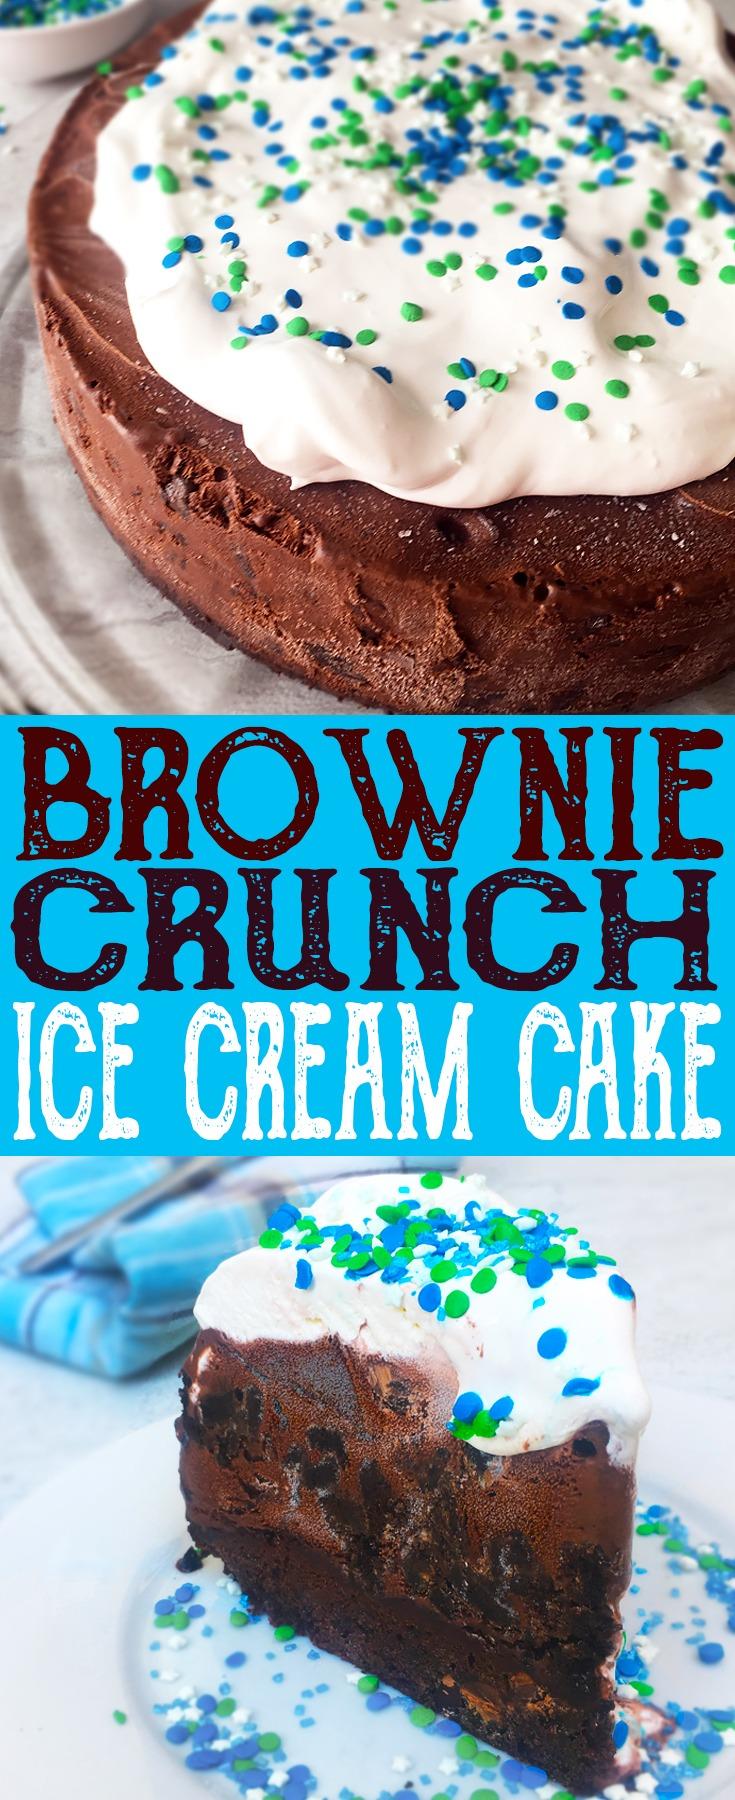 Brownie Crunch Ice Cream Cake with dark chocolate ice cream and OREO crunch!